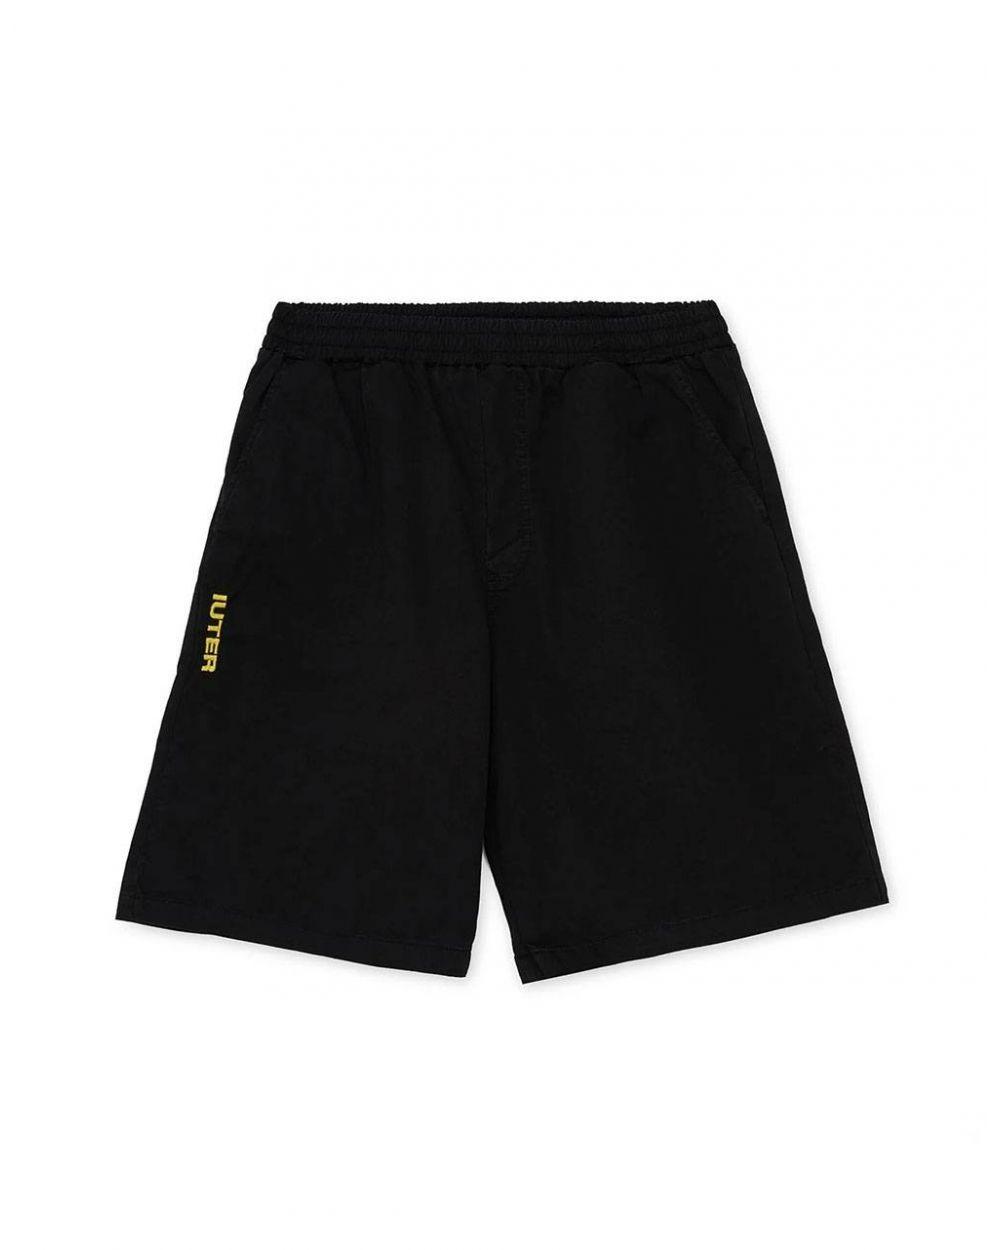 Iuter Jogger shorts - black IUTER Shorts 79,00€